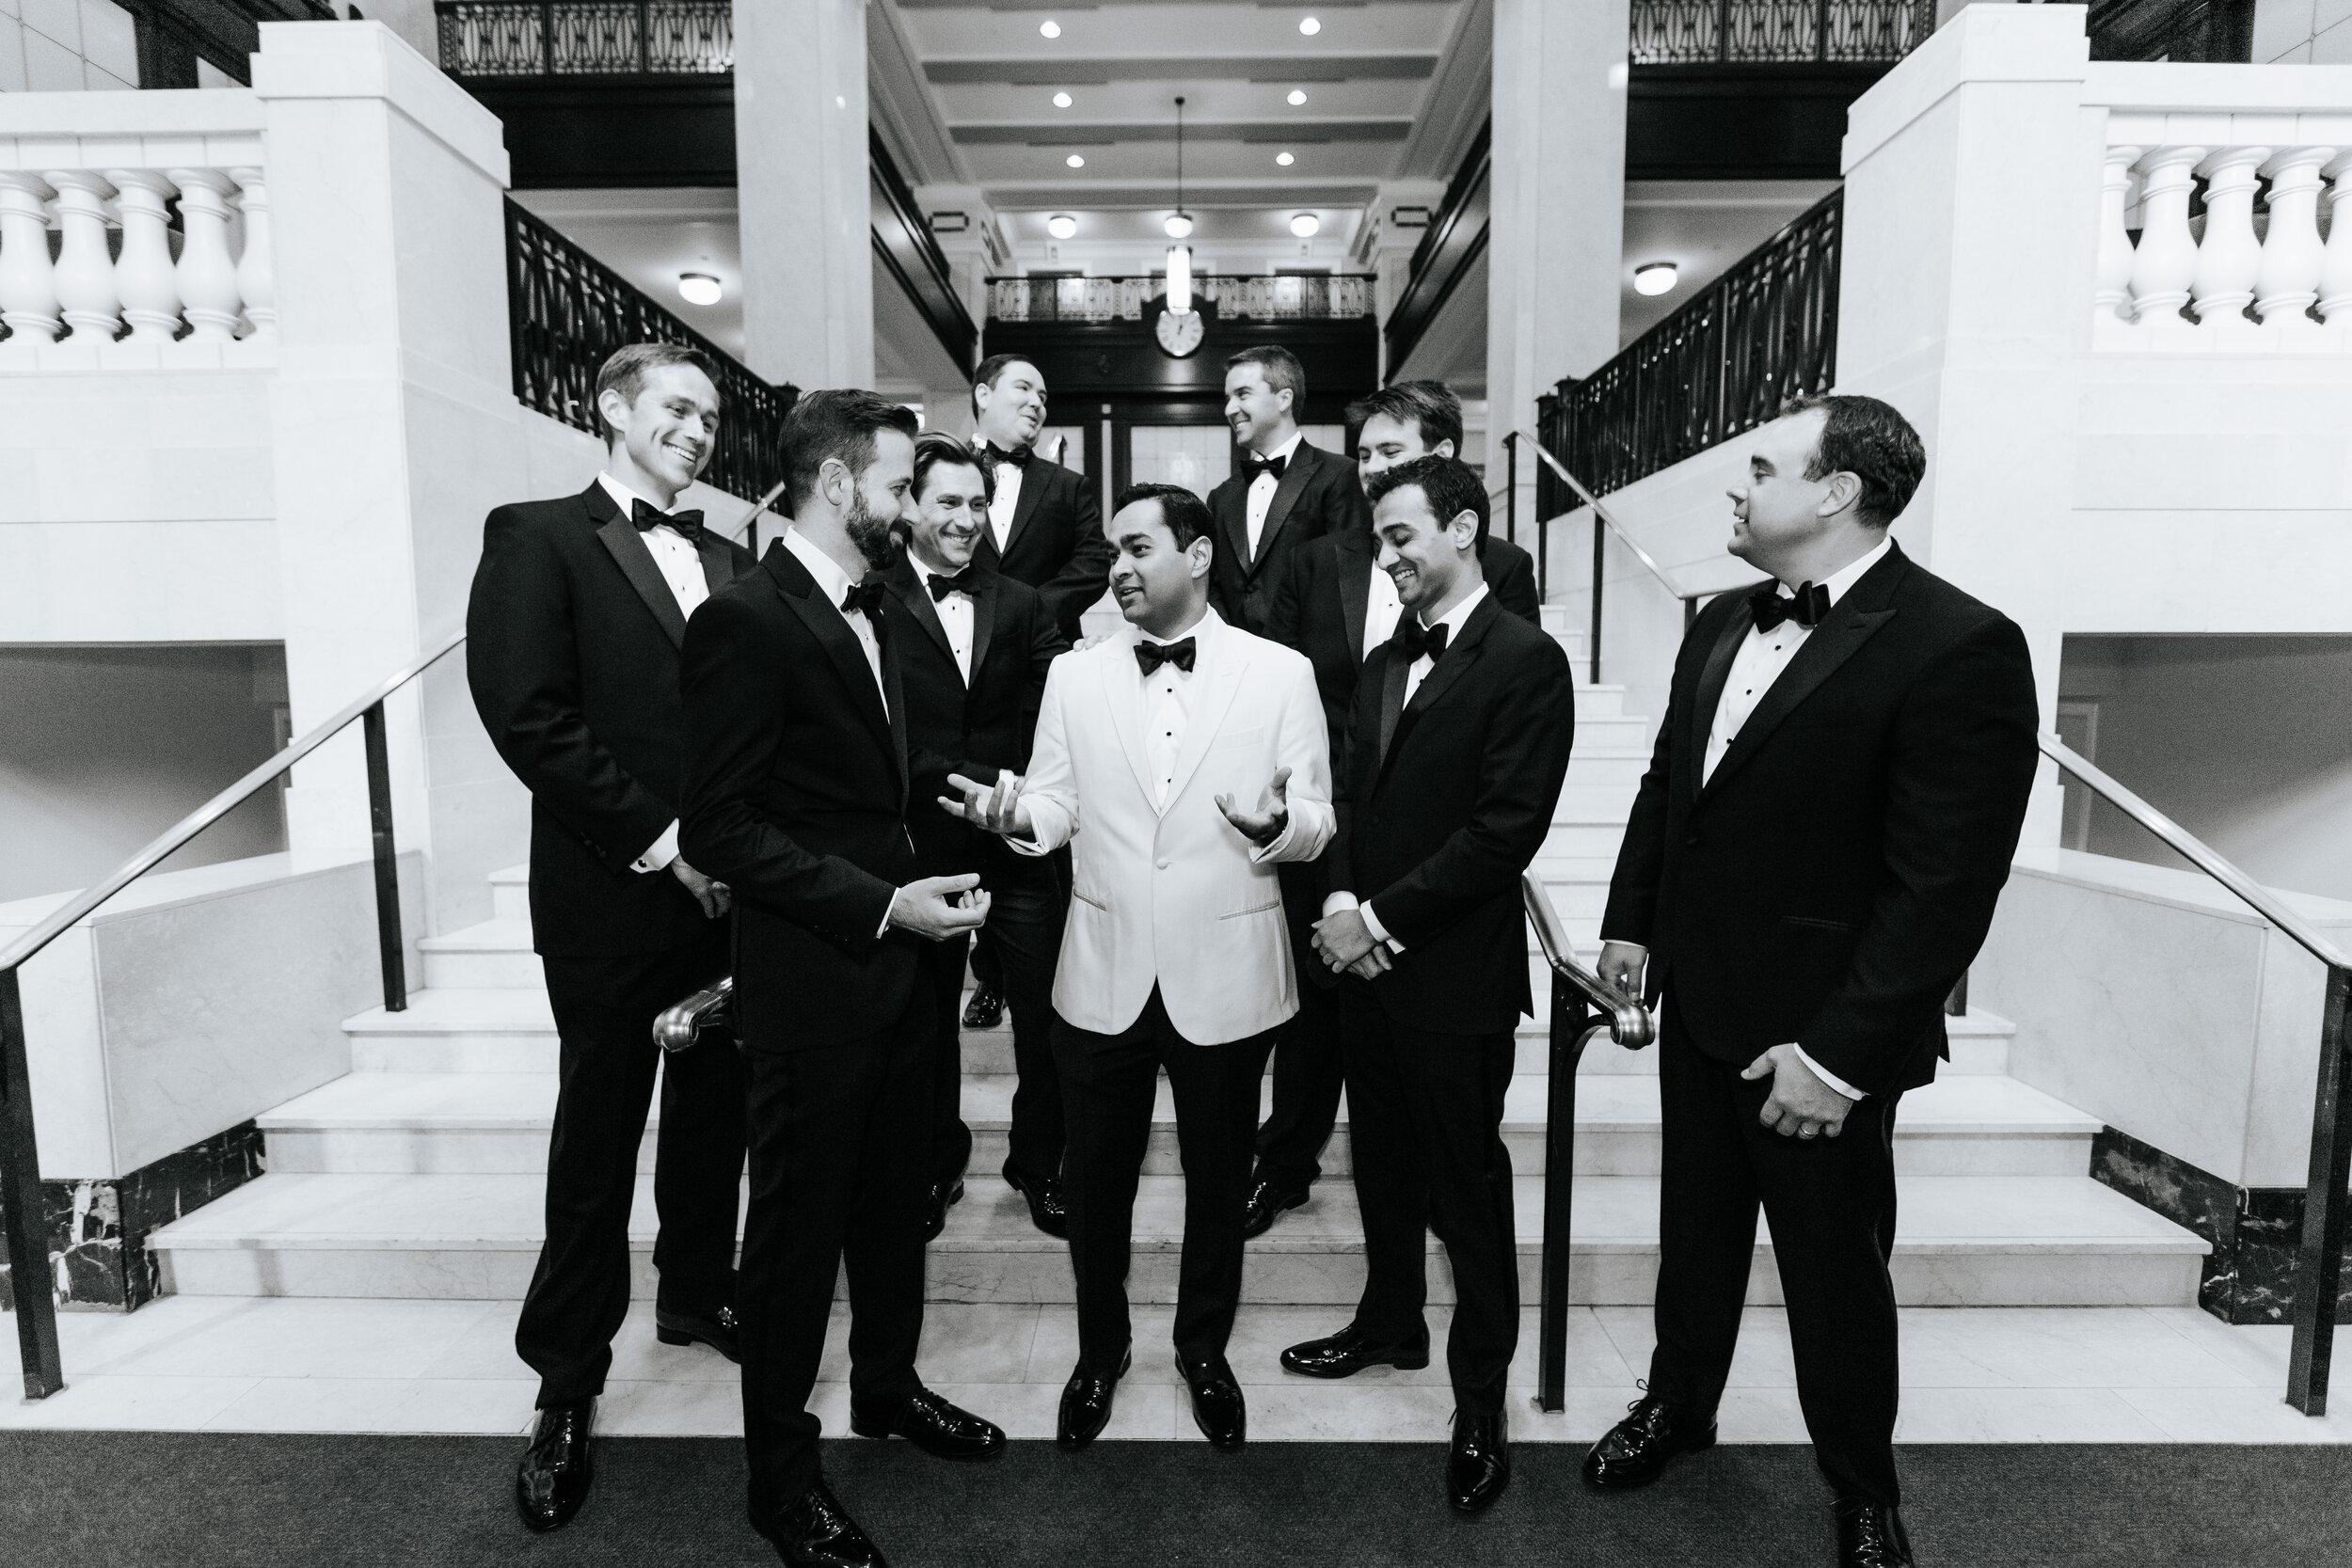 Cassie-Mrunal-Wedding-Quirk-Hotel-John-Marshall-Ballrooms-Richmond-Virginia-Photography-by-V-31.jpg